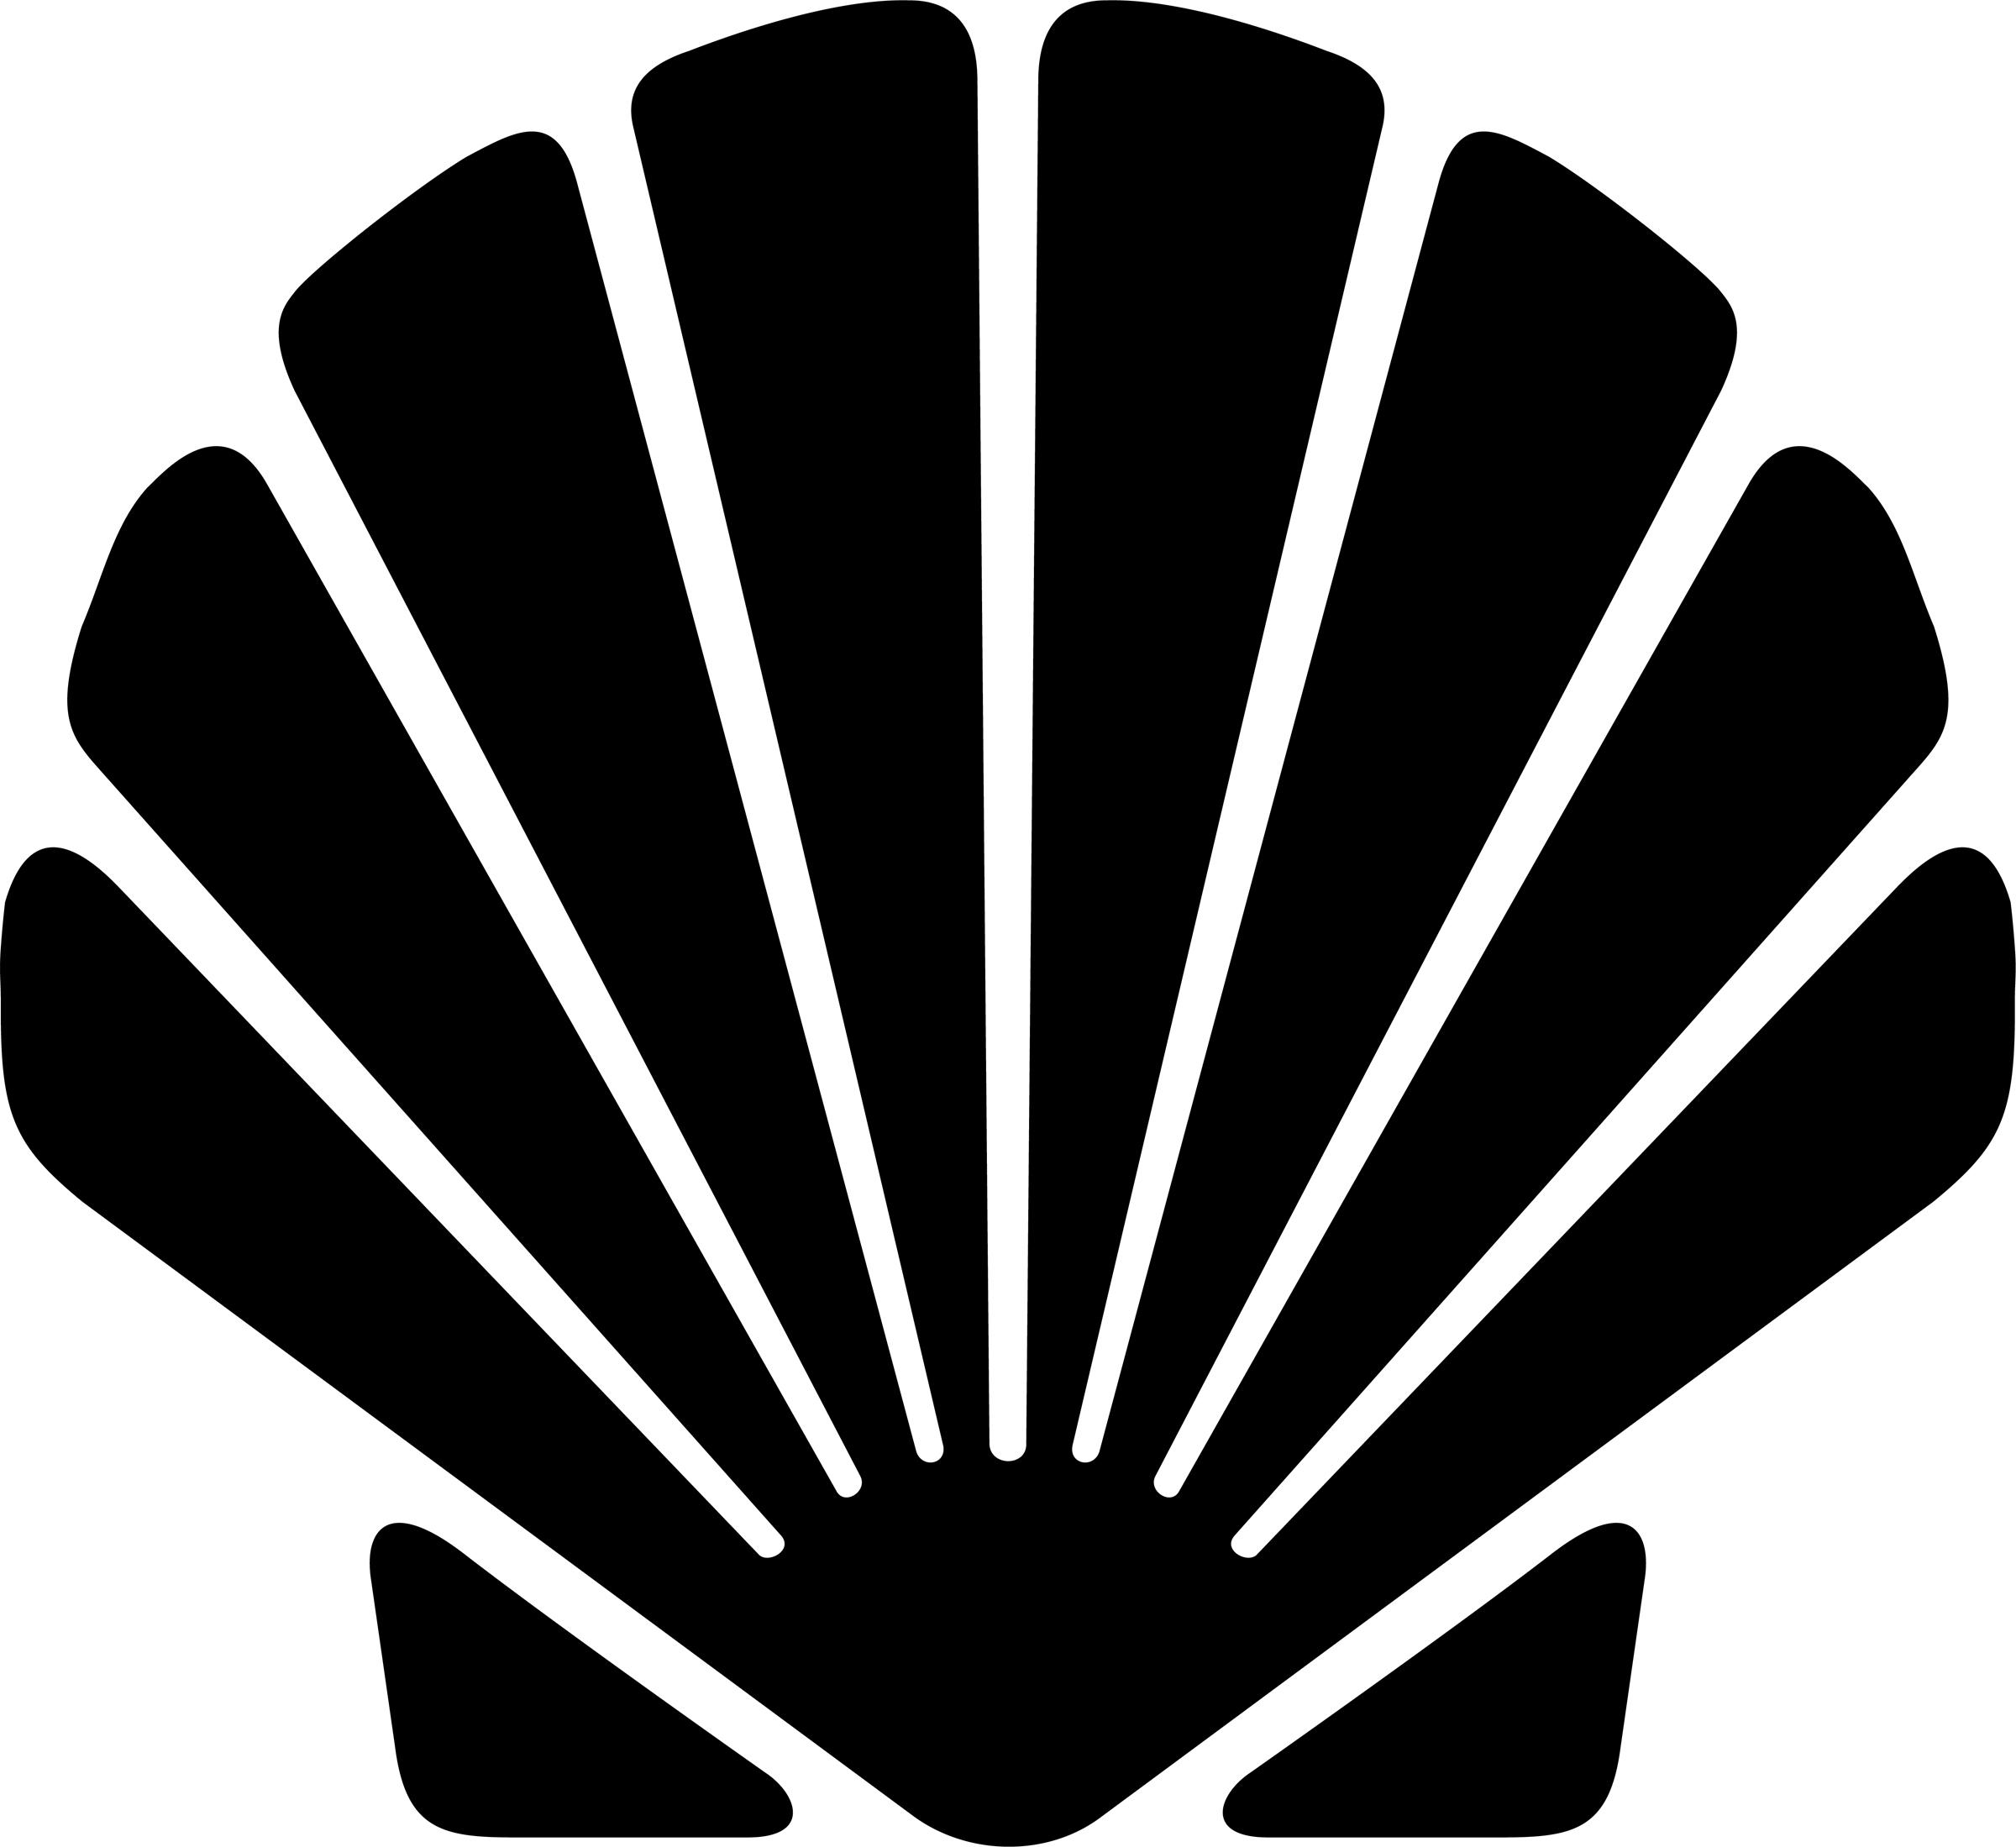 Shells clip art seashell cartoon clipart-Shells clip art seashell cartoon clipart seashell cartoon vector-10